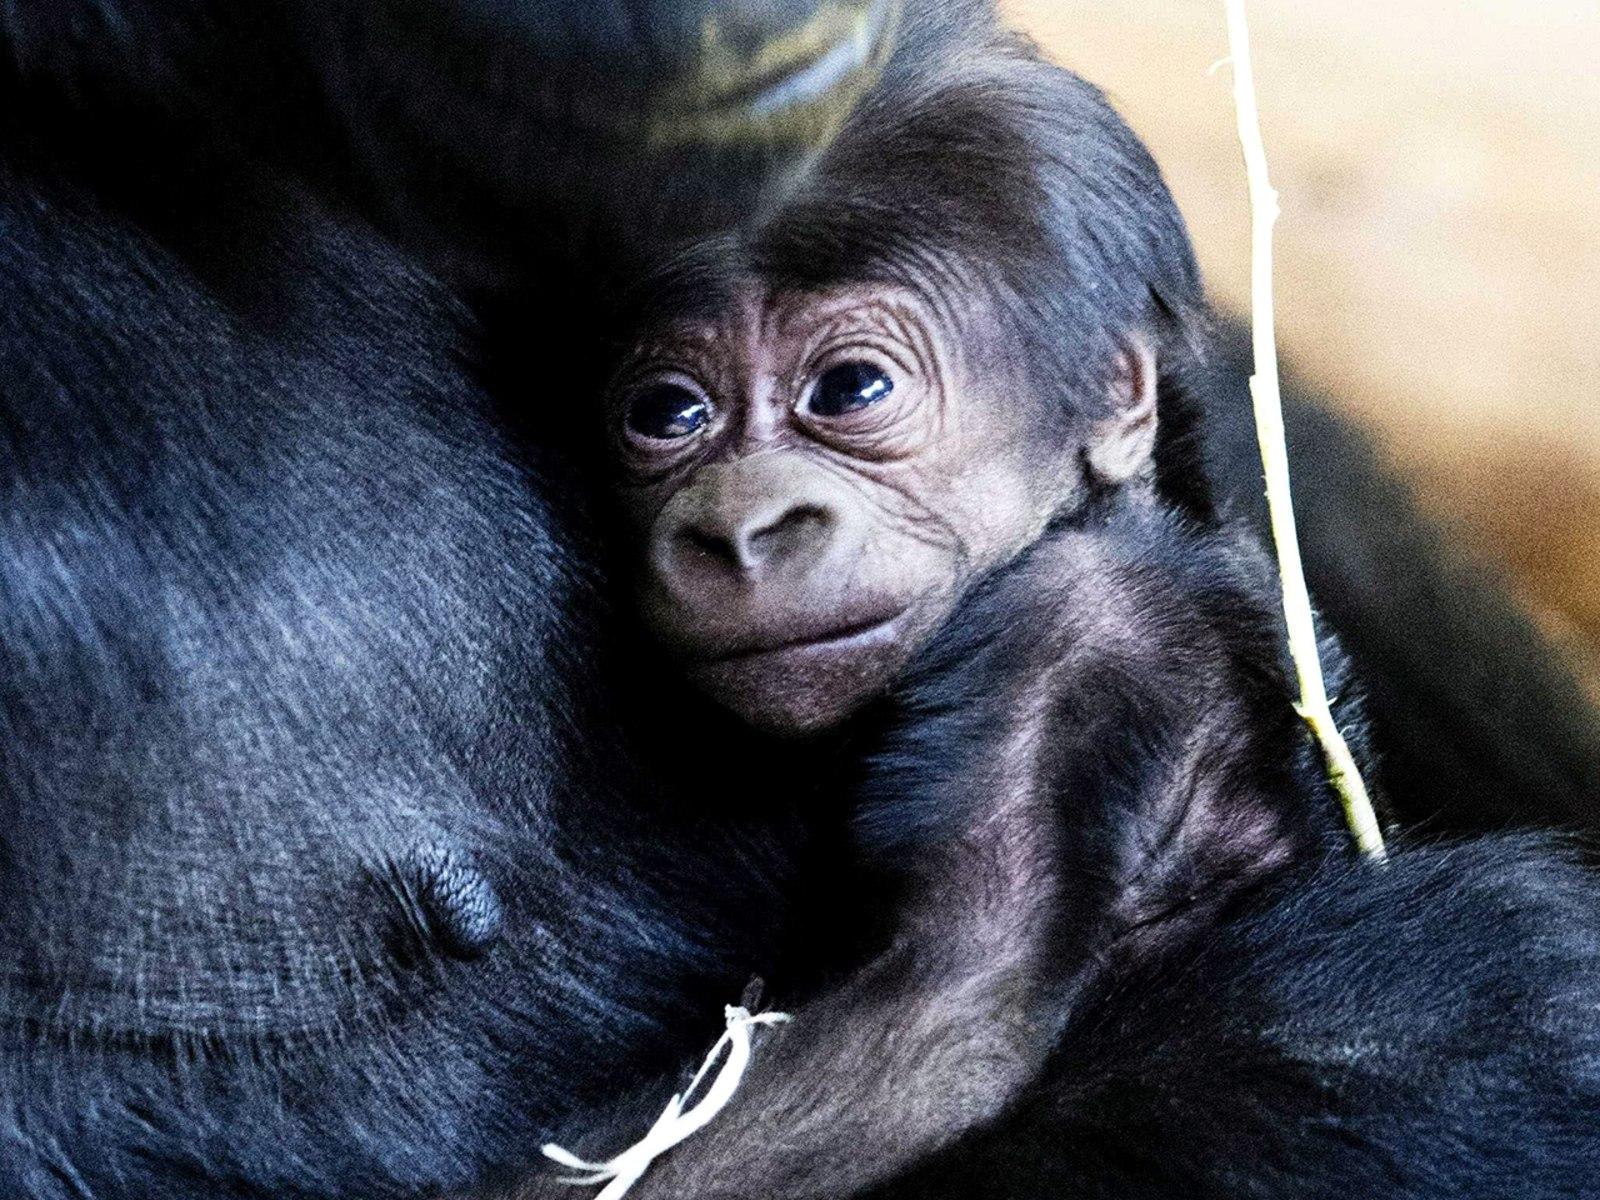 Image: Baby gorilla born at Arnhem zoo